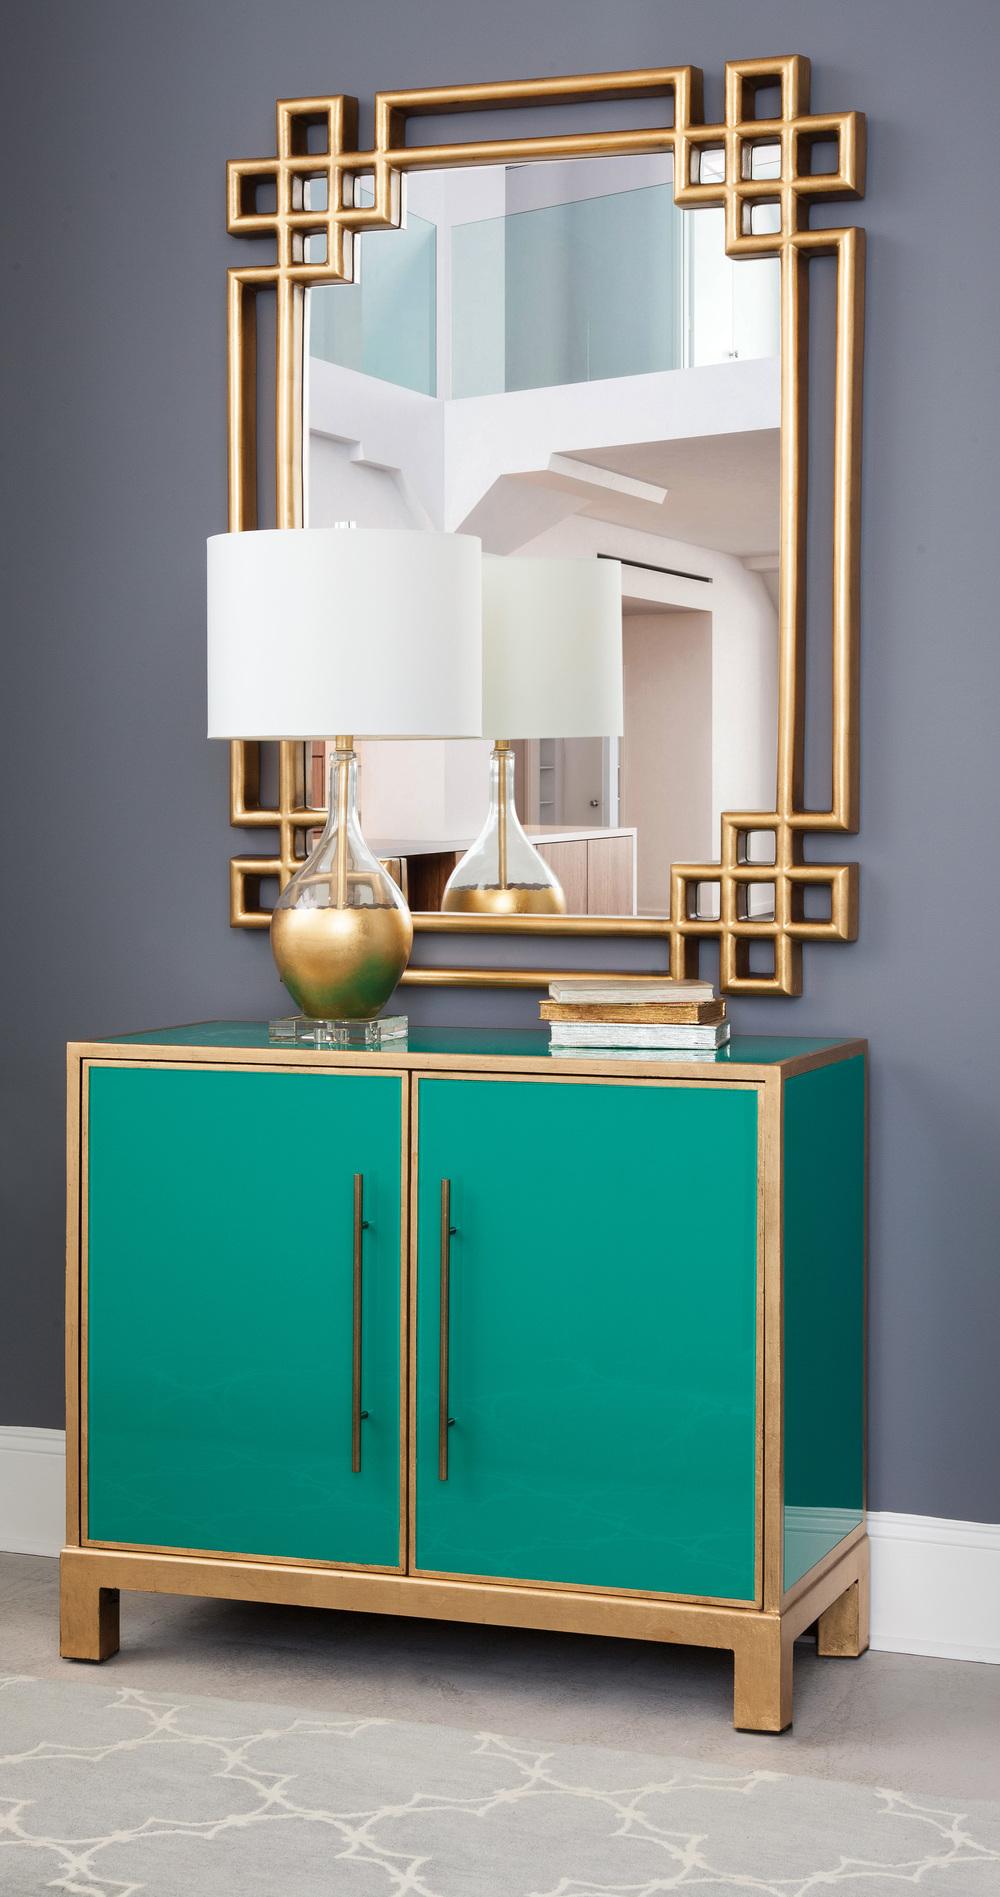 Bassett Mirror Company - Fenwick Hall Cabinet